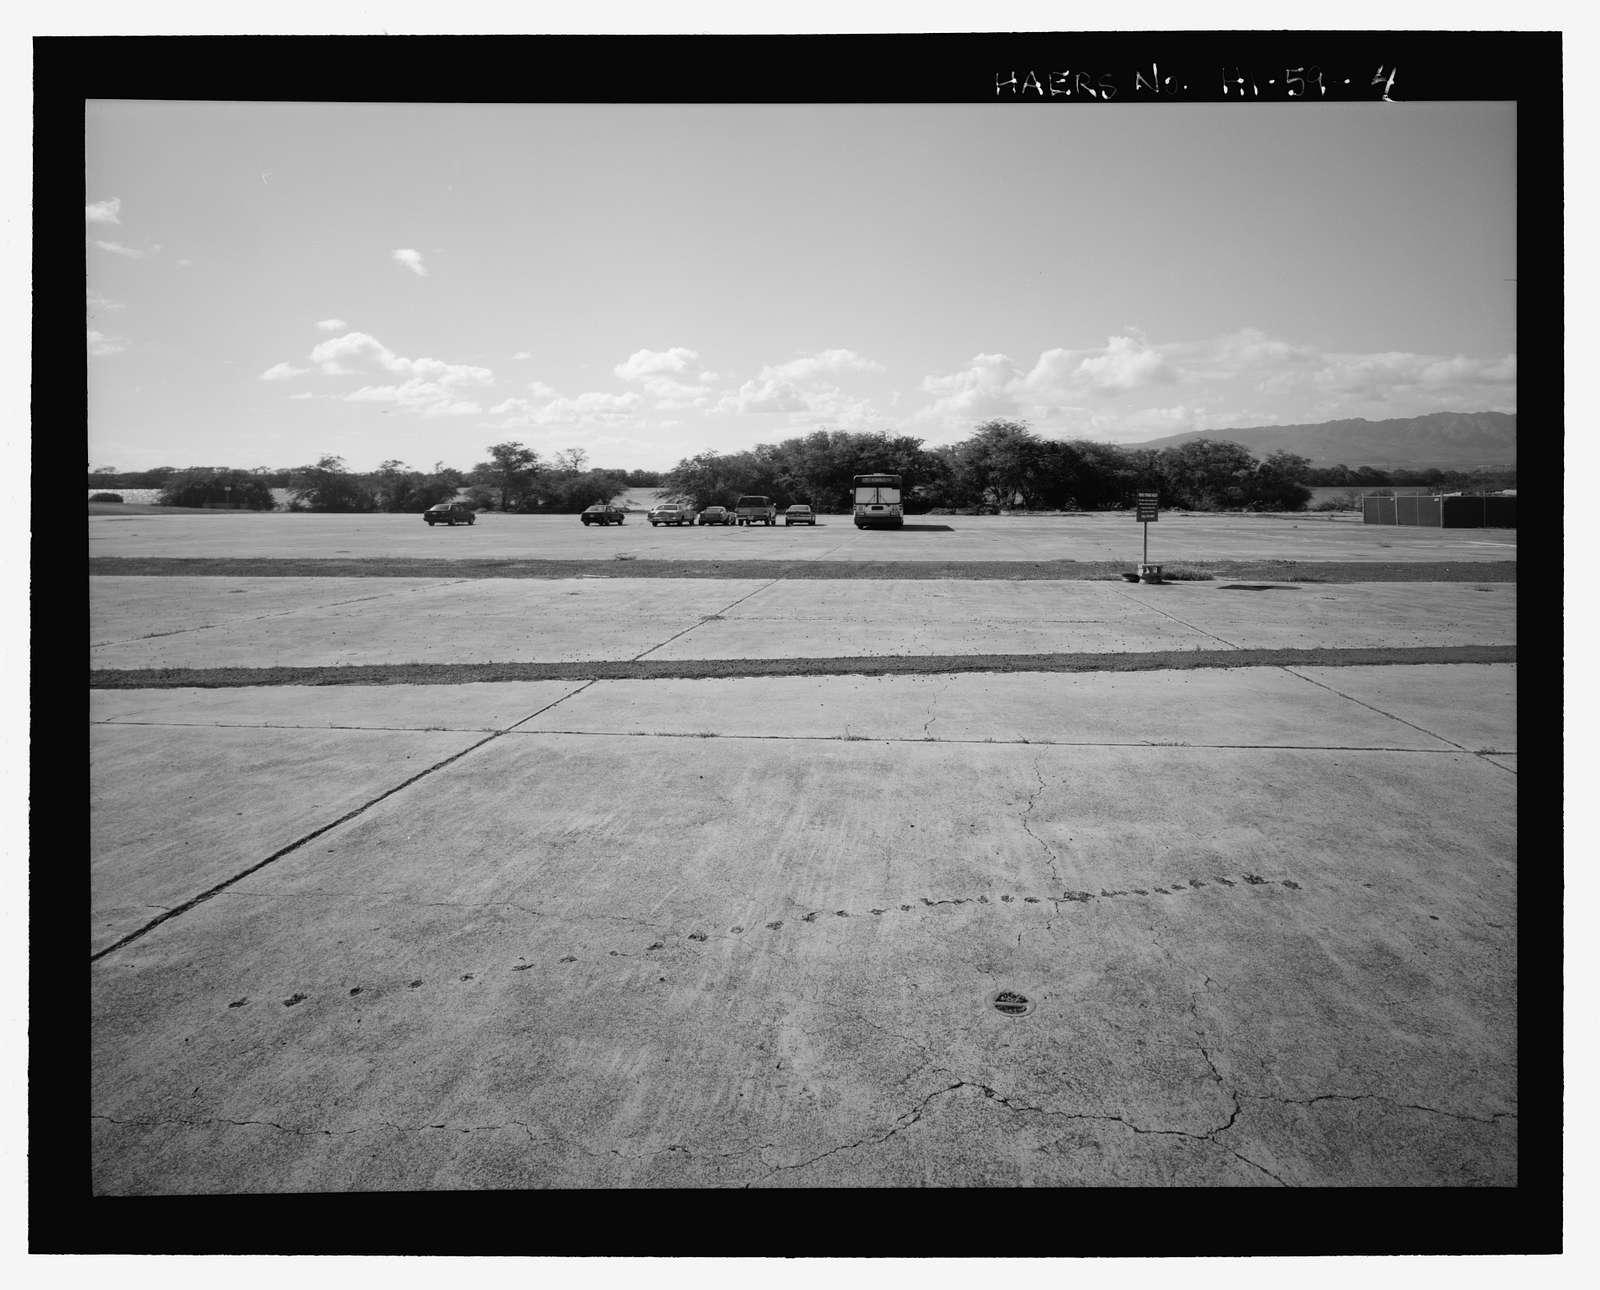 U.S. Naval Base, Pearl Harbor, Seaplane Ramps - World War II Type, Southwest and west shore of Ford Island, near Wasp Boulevard, Pearl City, Honolulu County, HI